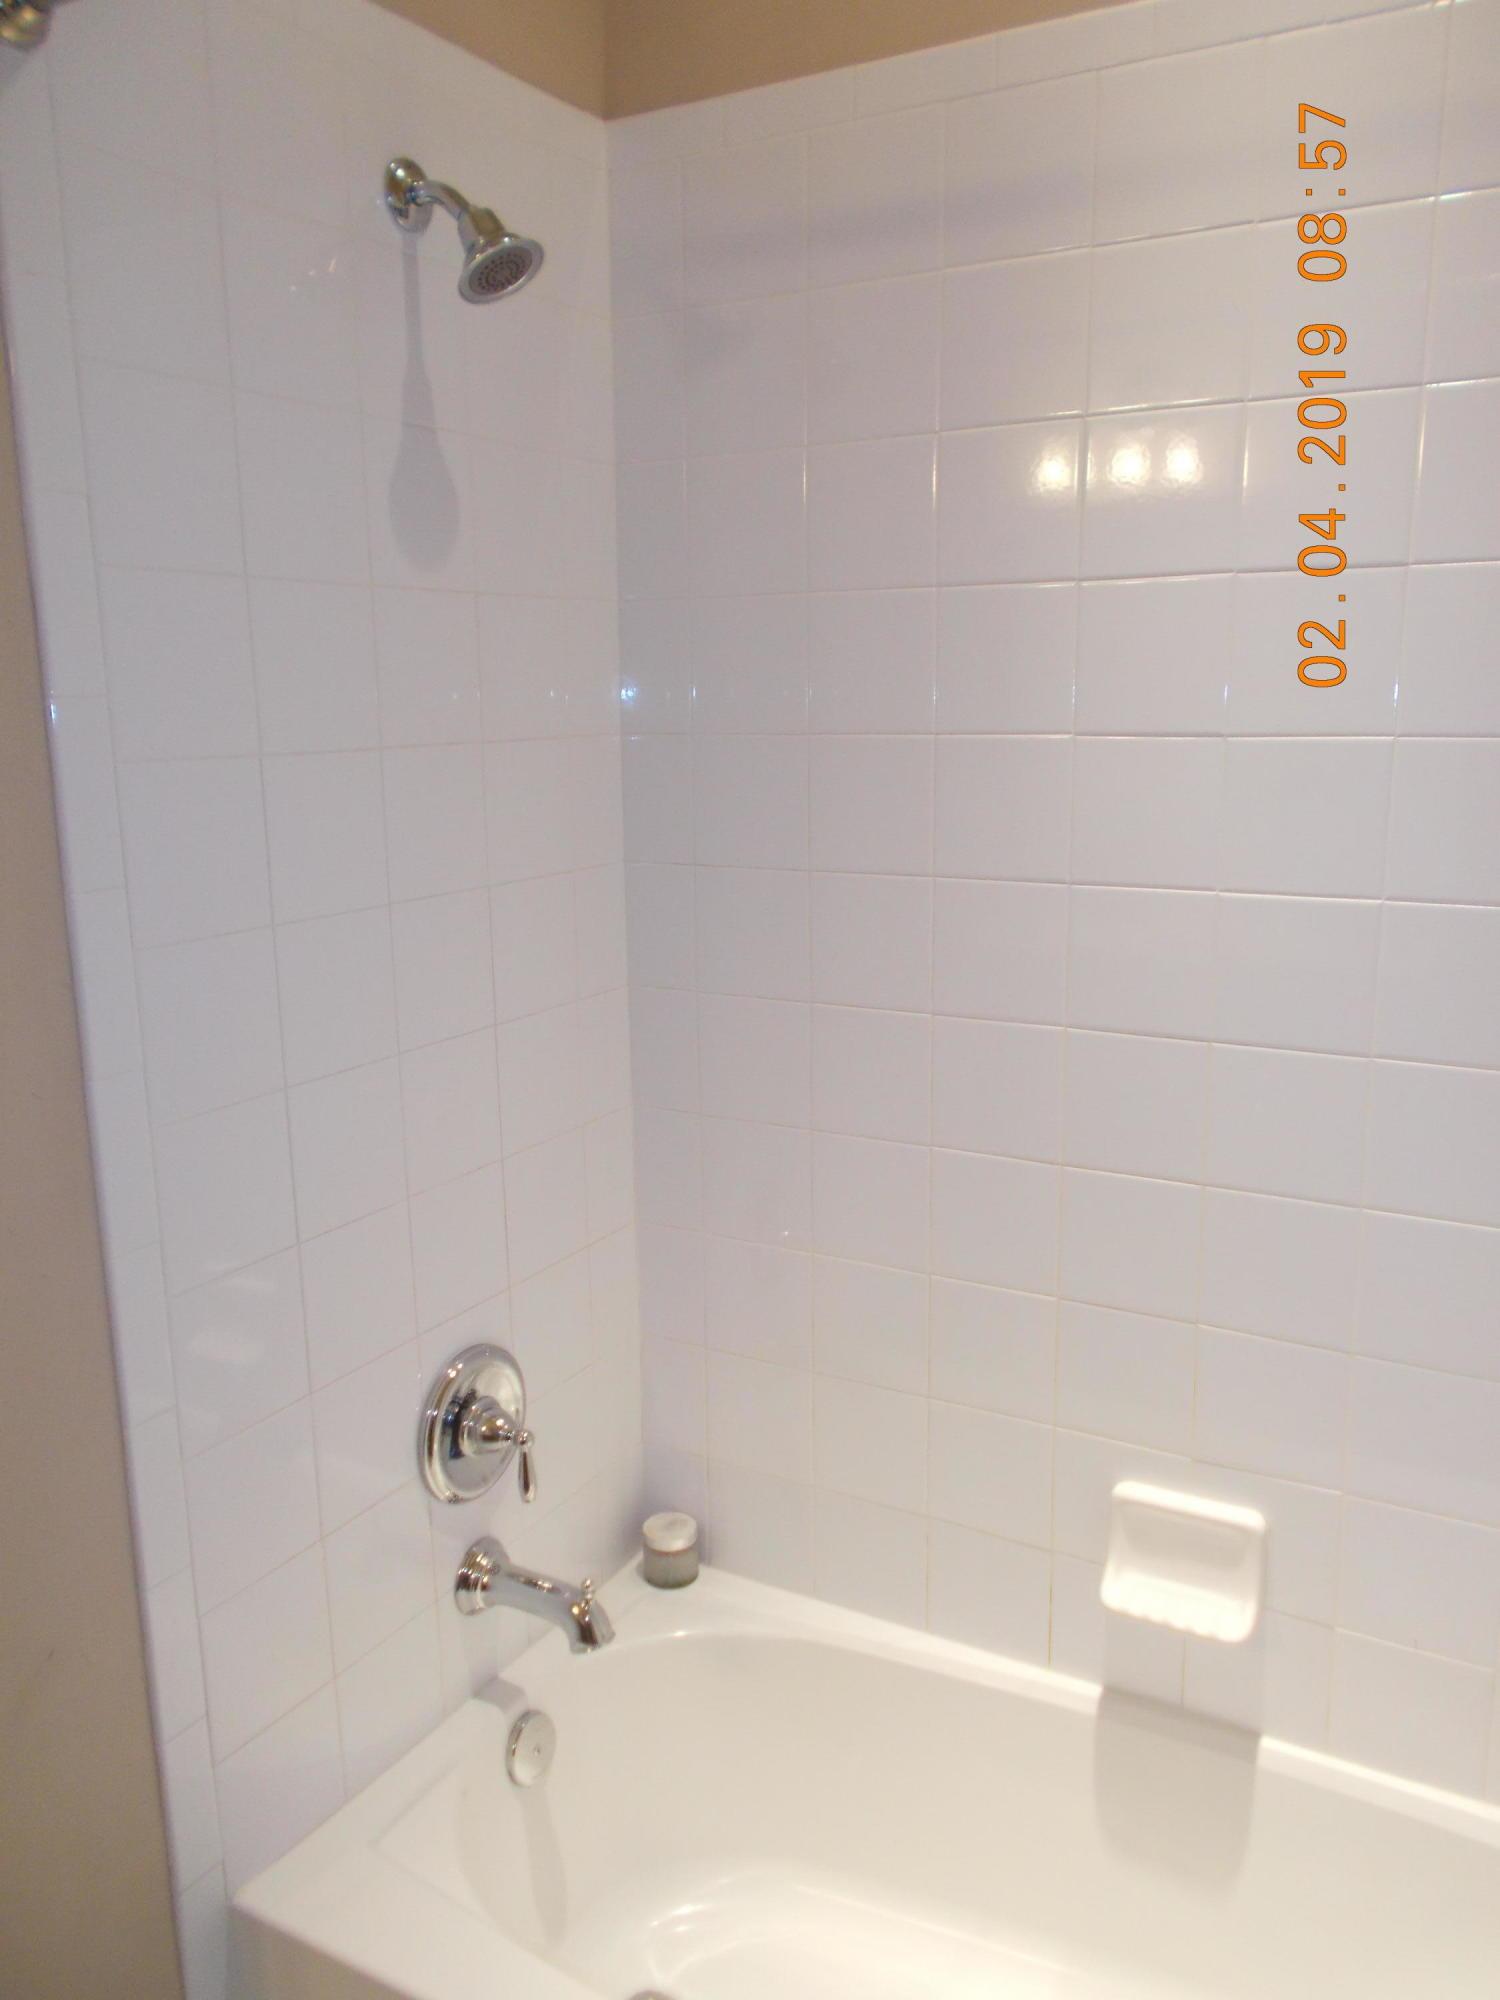 2730 Avalon Way, Jupiter, Florida 33458, 3 Bedrooms Bedrooms, ,2.1 BathroomsBathrooms,A,Townhouse,Avalon,RX-10501827